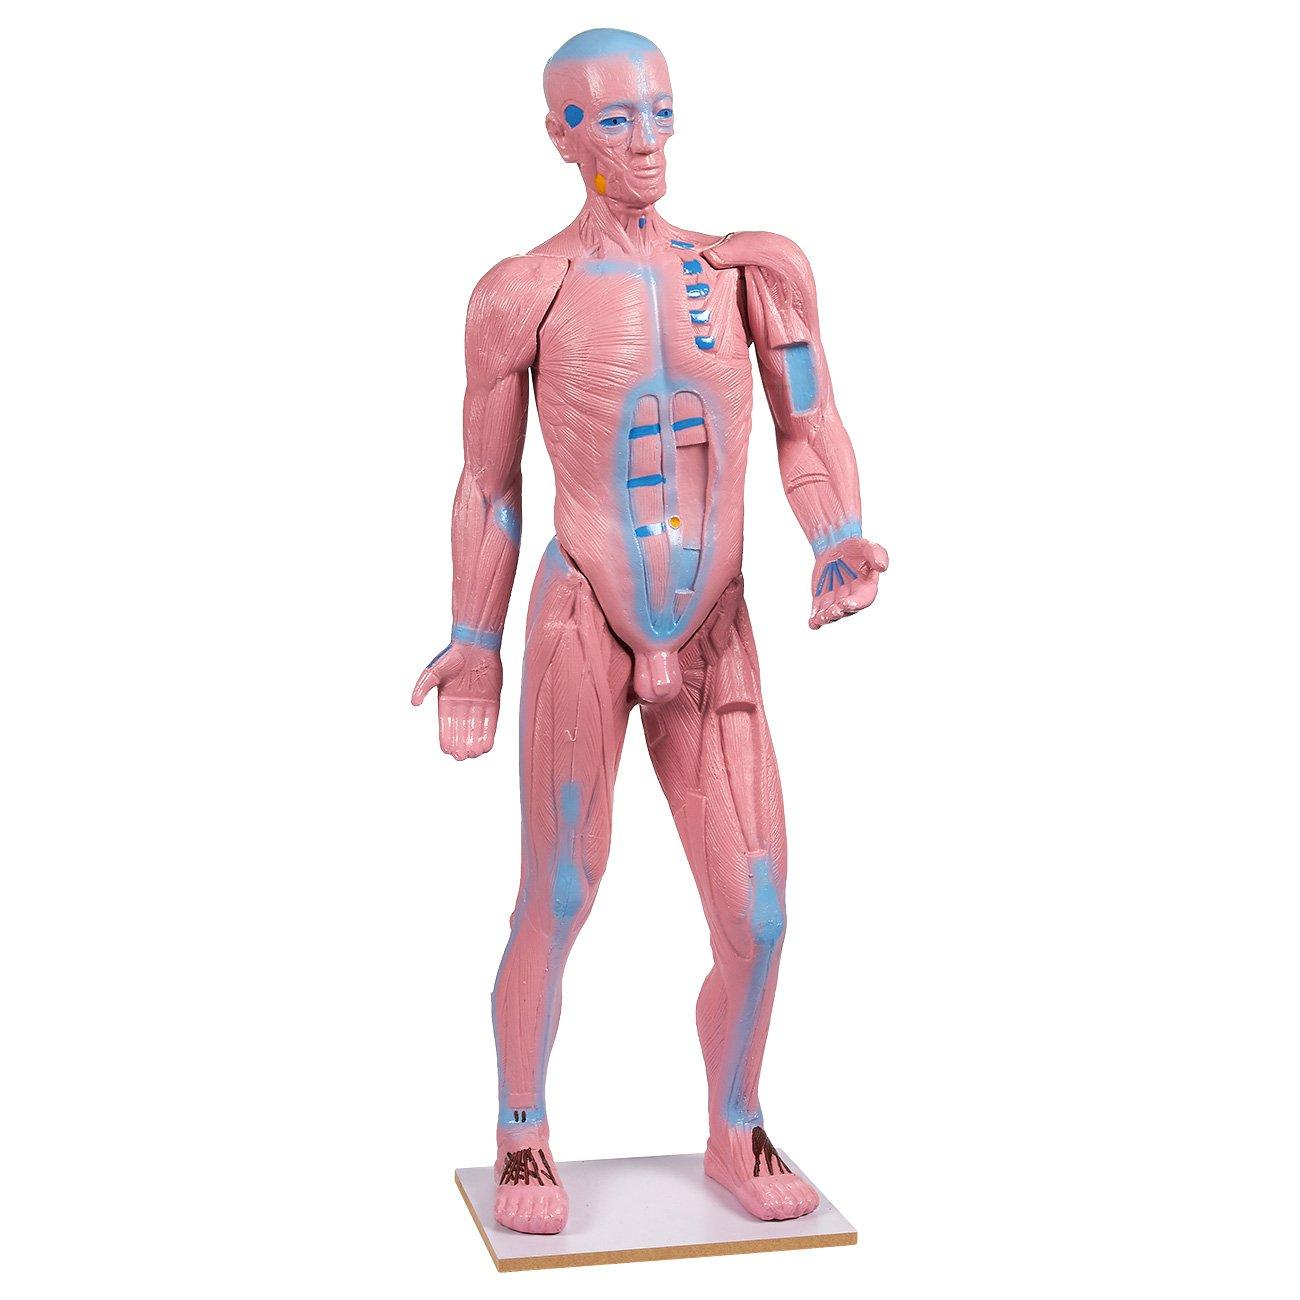 Human Muscle Anatomy Model - 30-Inch - Anatomical Muscular